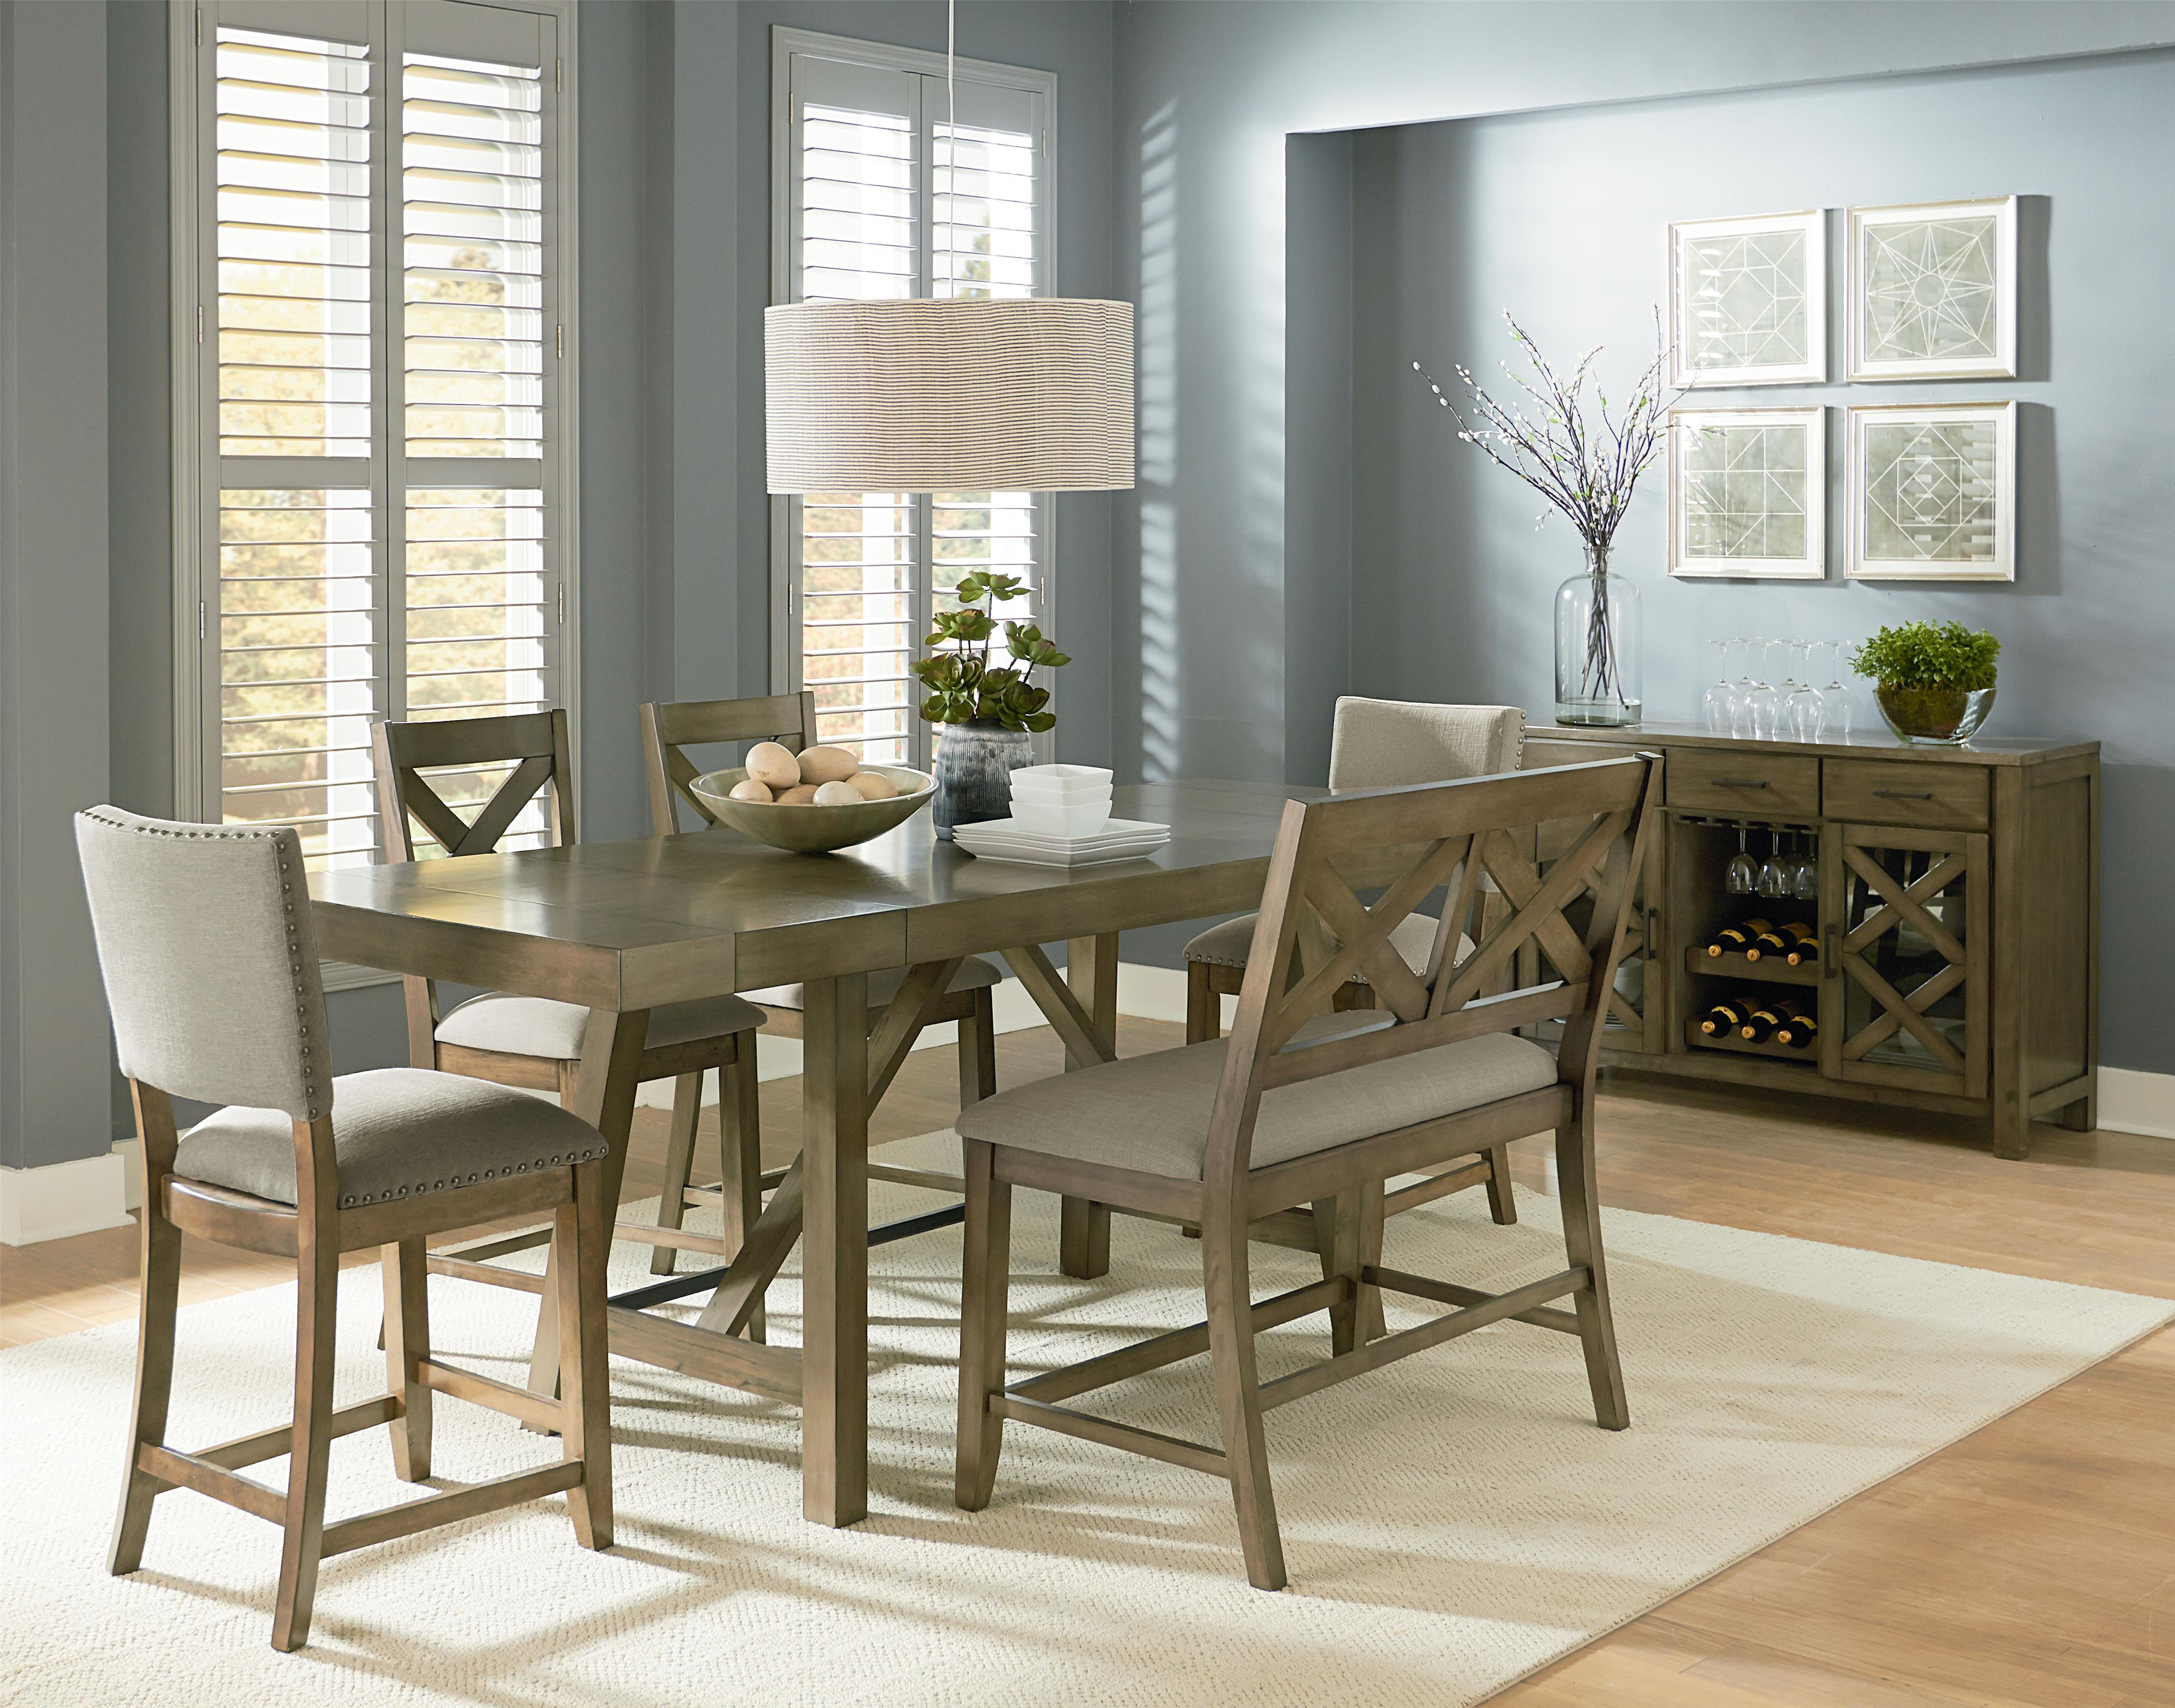 6 Piece Dining Room Sets